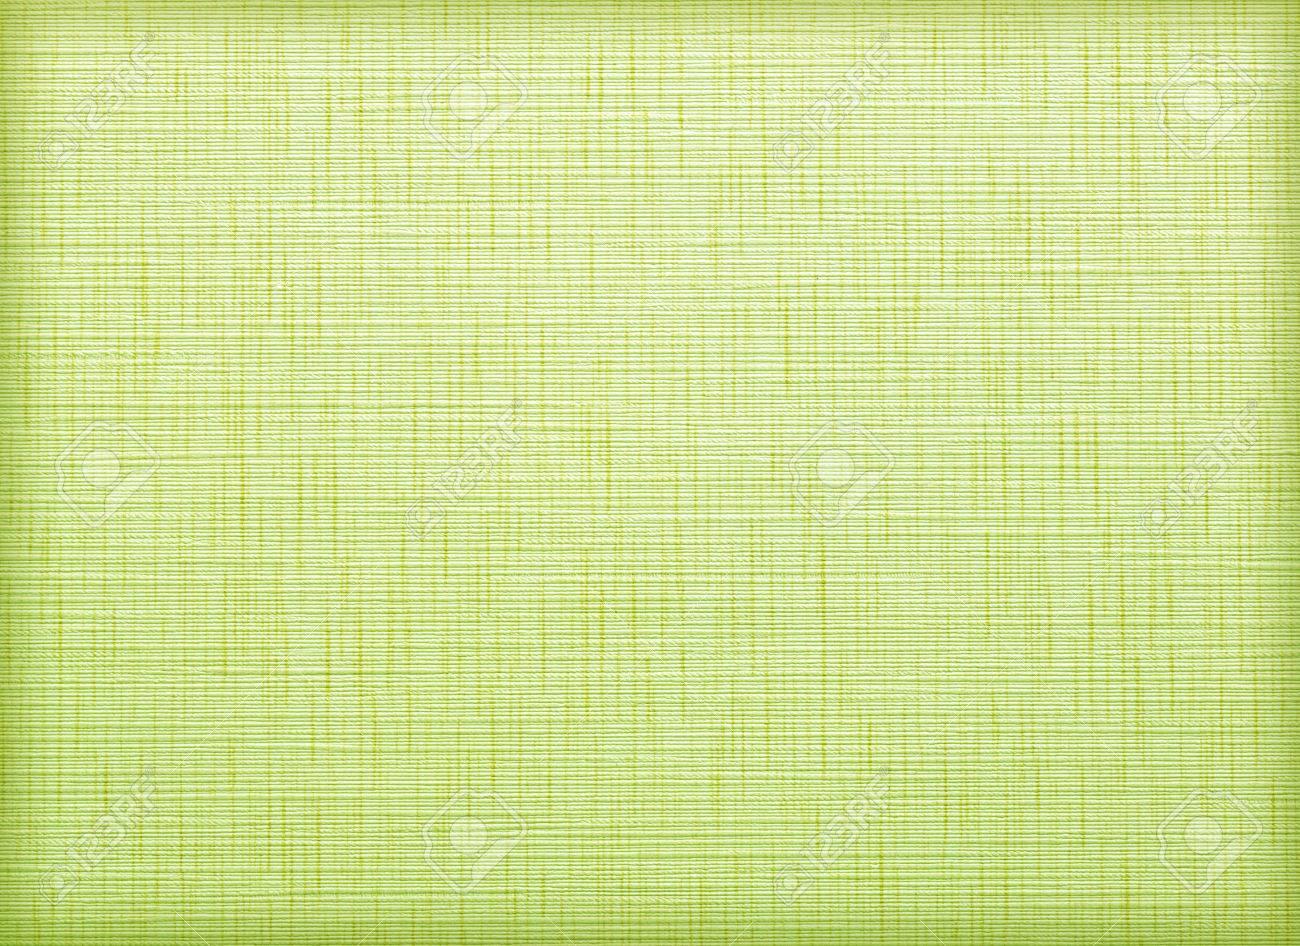 fond d ecran fond vert peint vintage decor